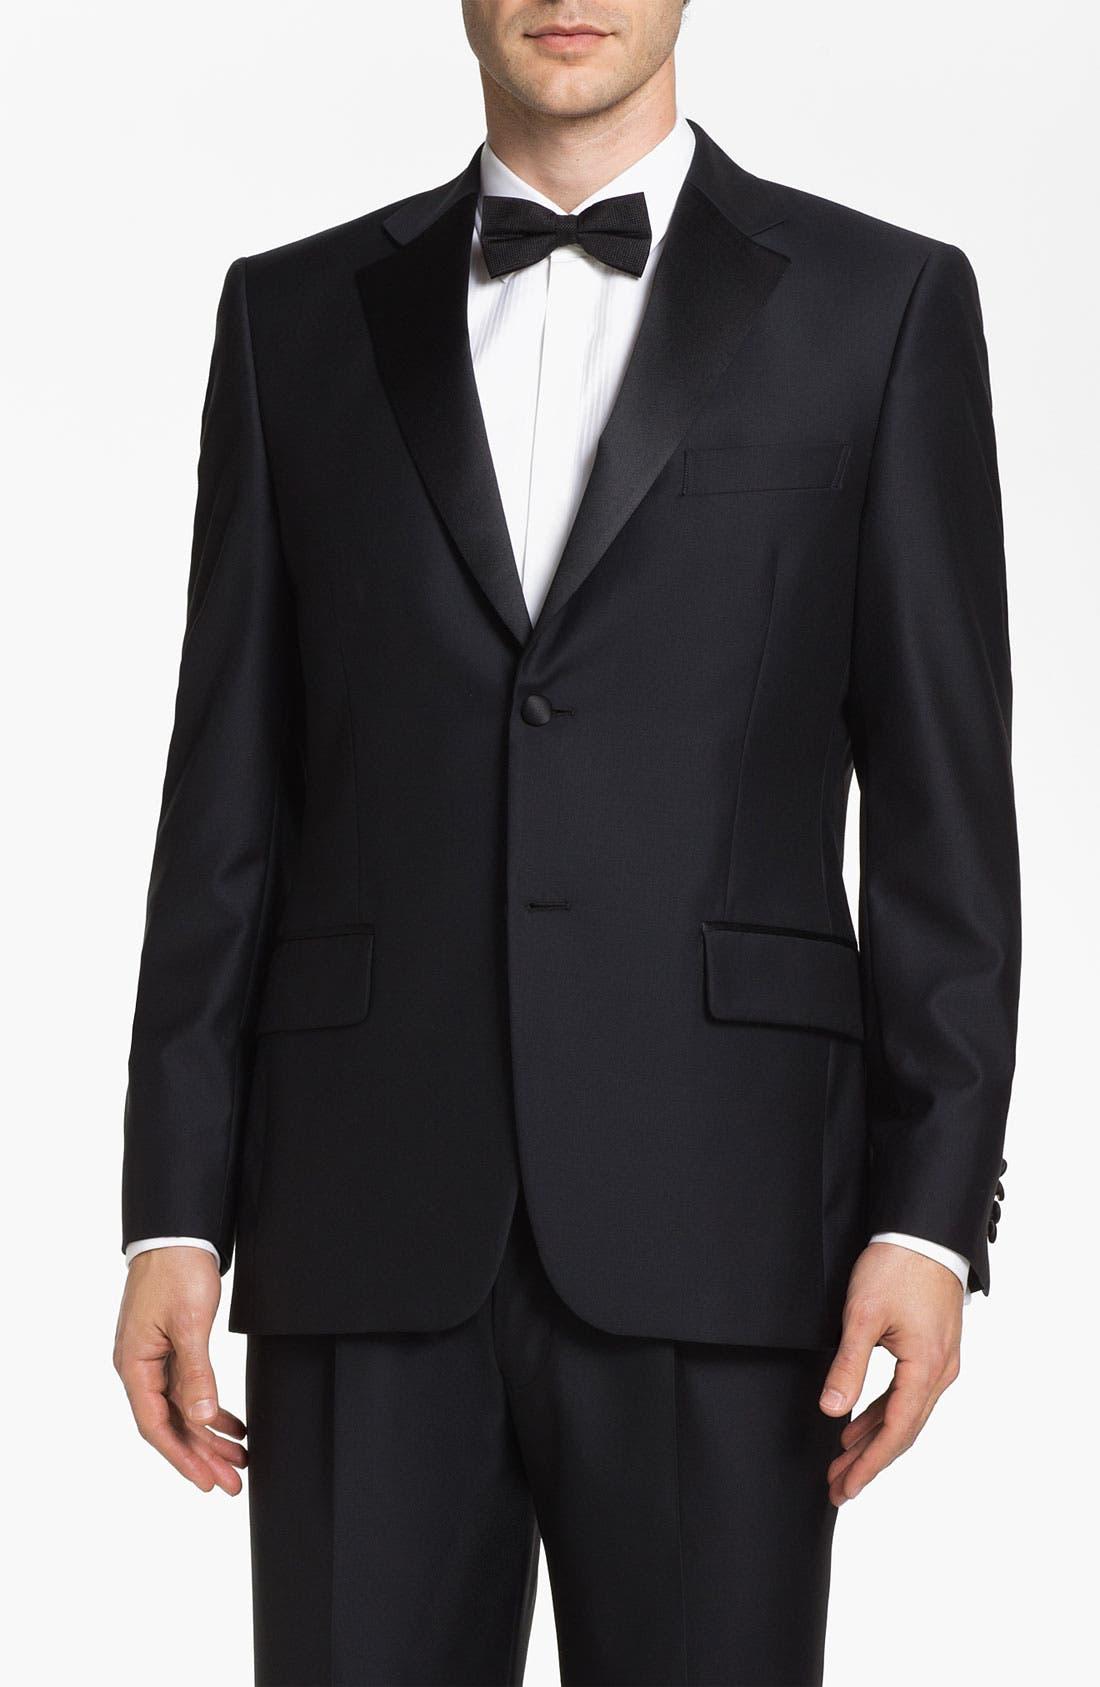 Main Image - John W. Nordstrom® Signature Wool Dinner Jacket